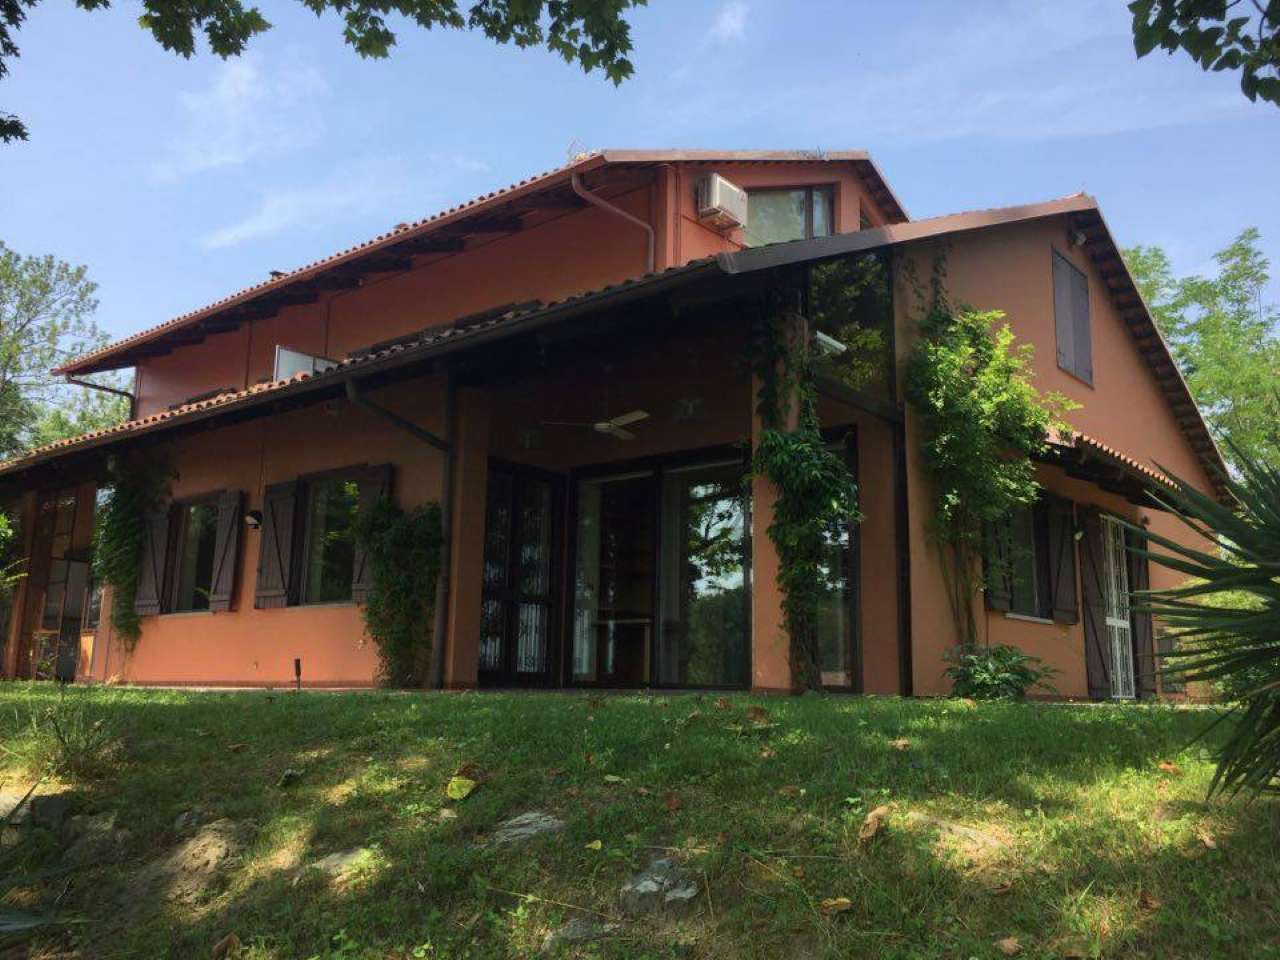 Villa for Sale to Pavarolo